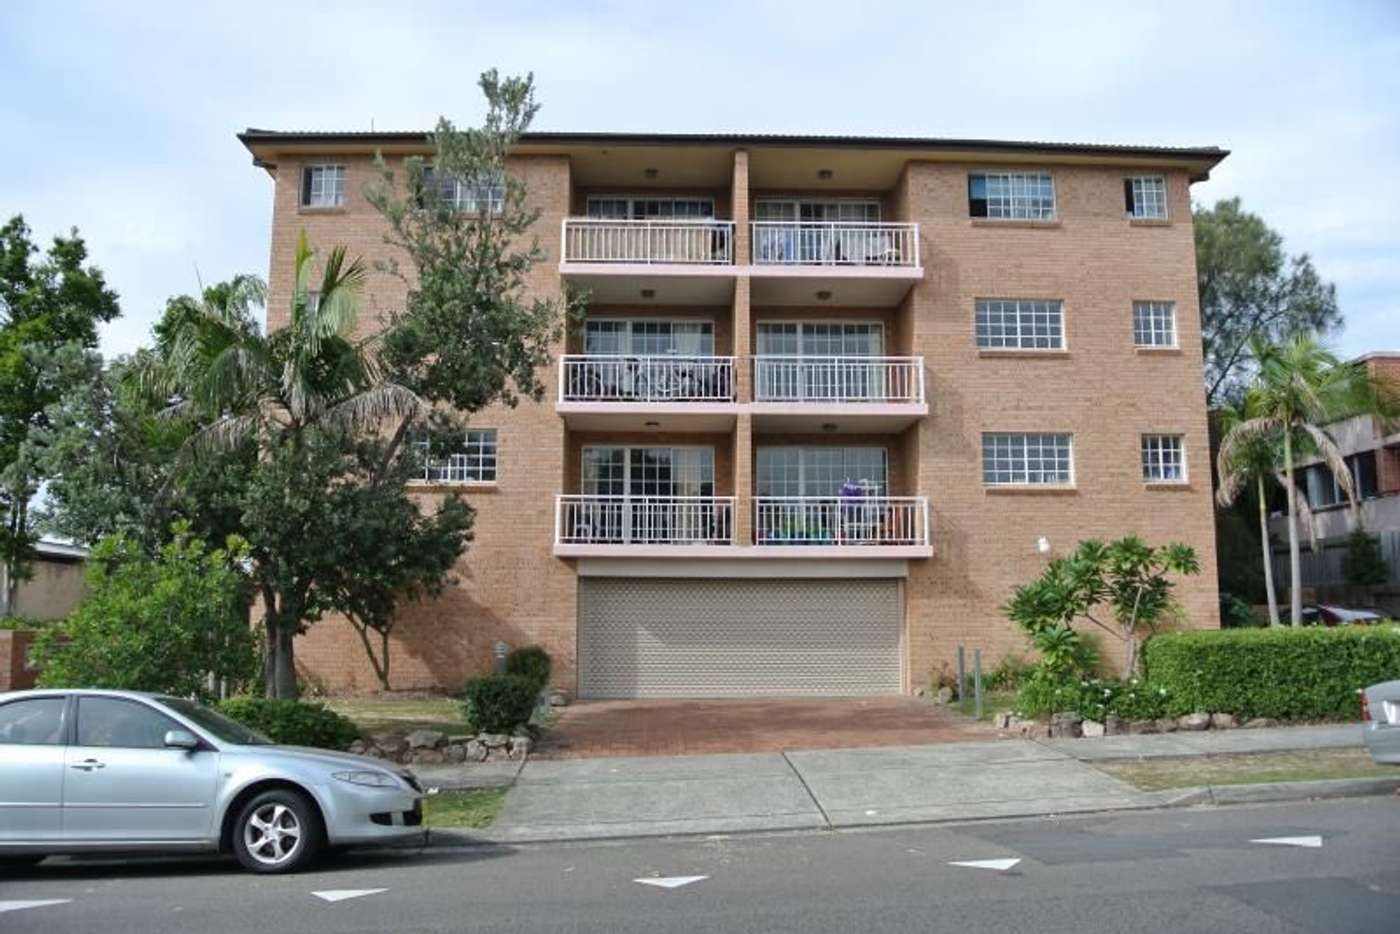 Main view of Homely apartment listing, 4/7-9 Kensington Road, Kensington NSW 2033